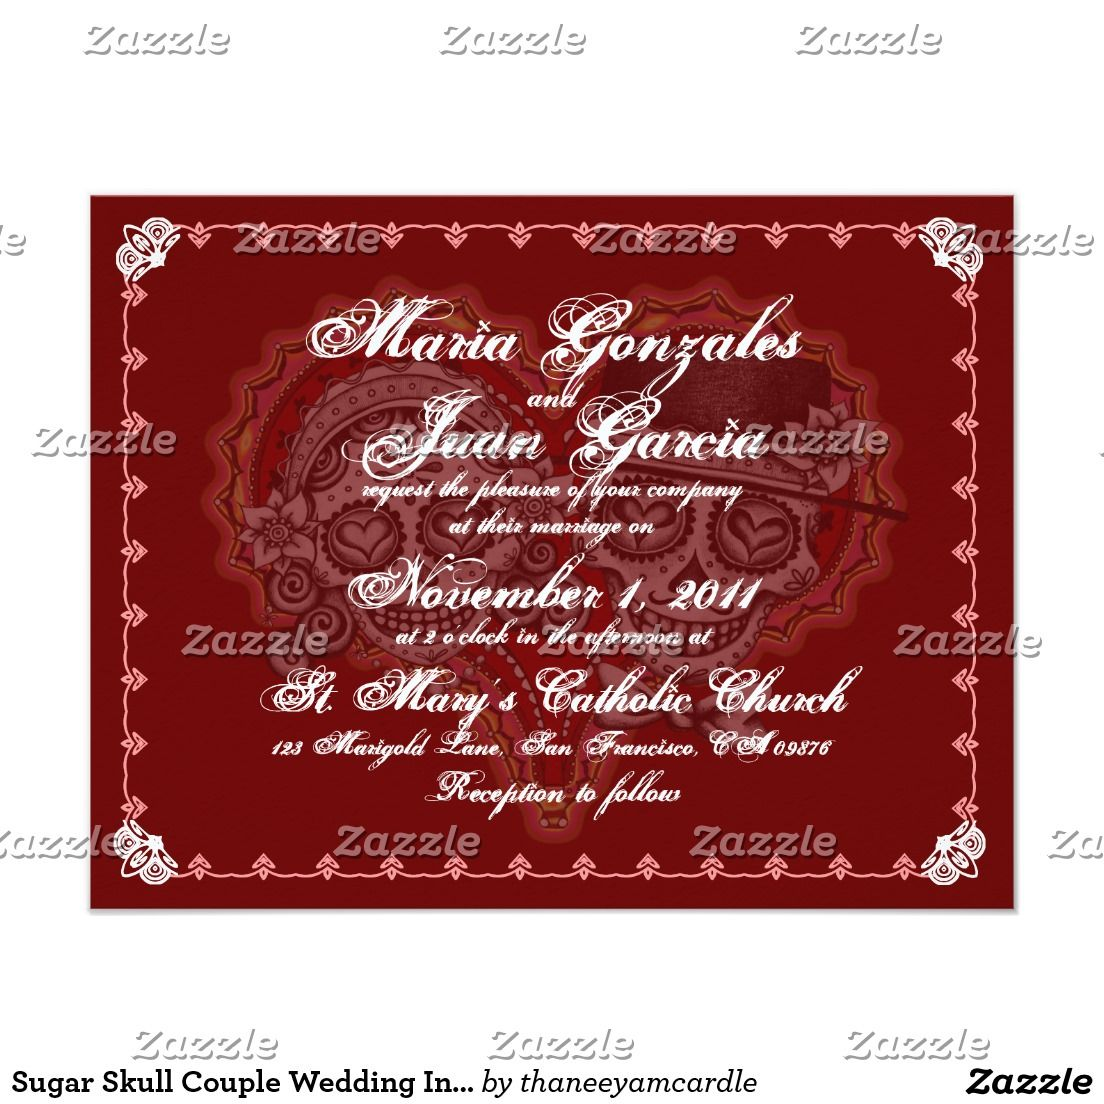 Old Fashioned Wedding Invitation Zazzle Image - Invitations and ...